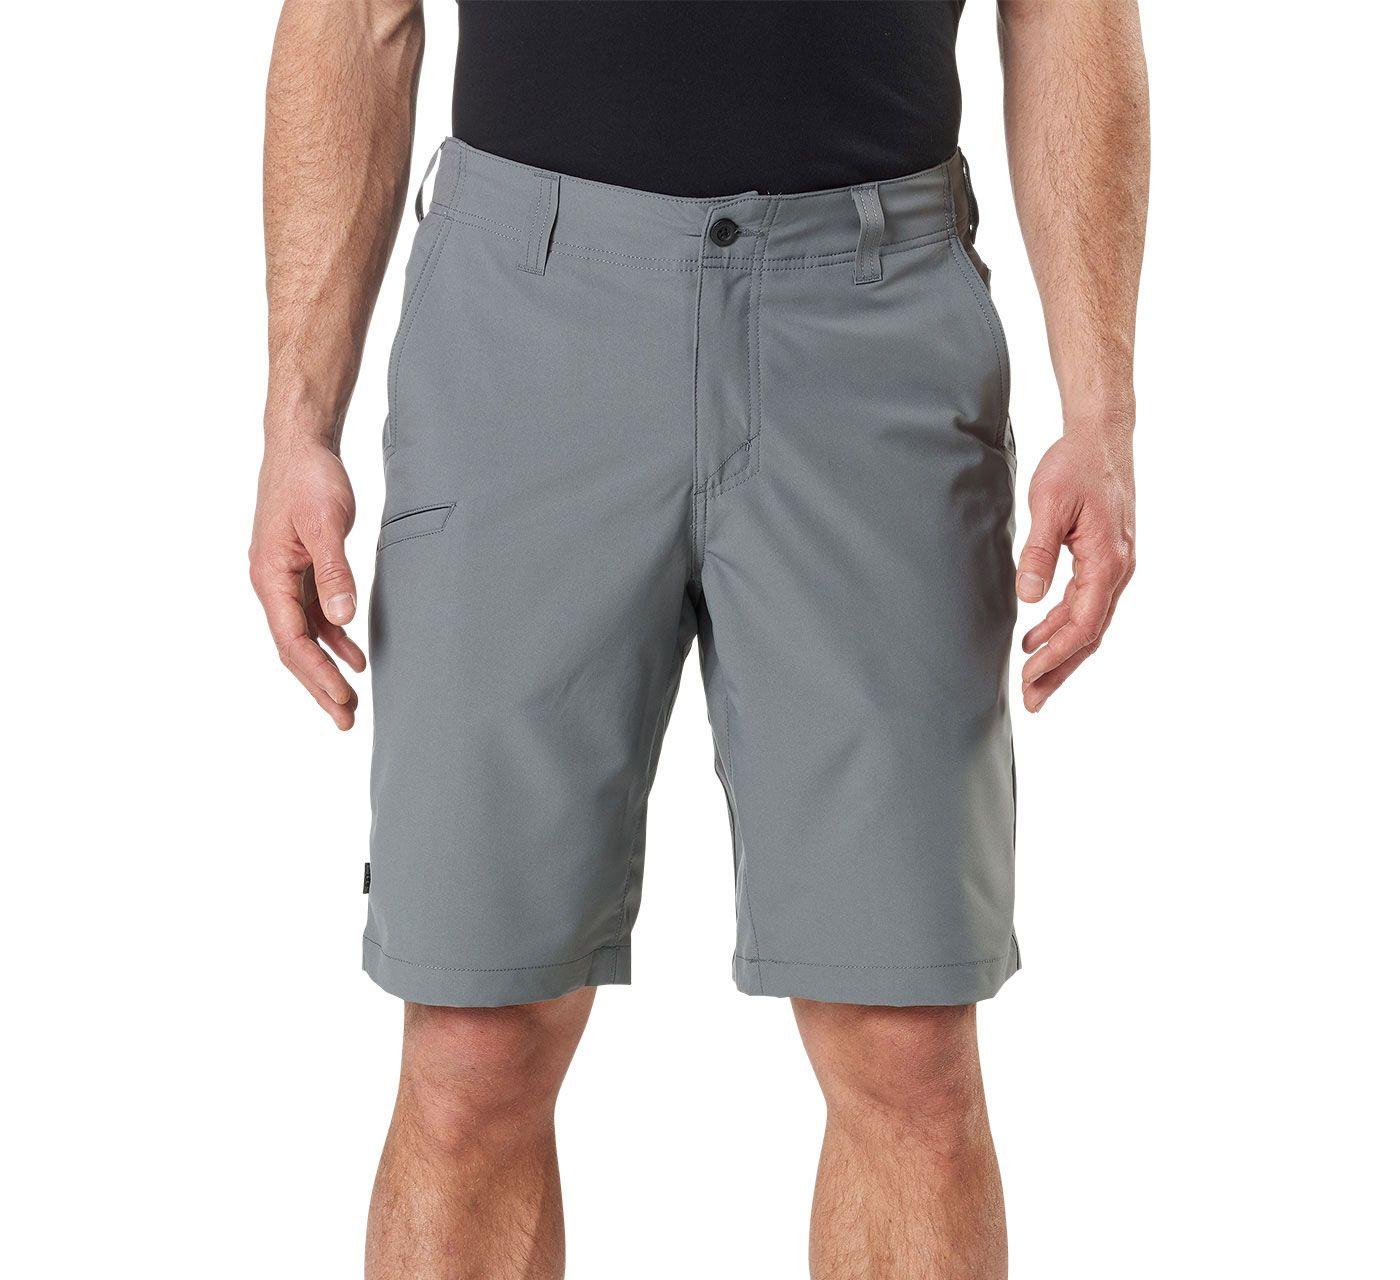 5.11 Tactical Men's Base Shorts